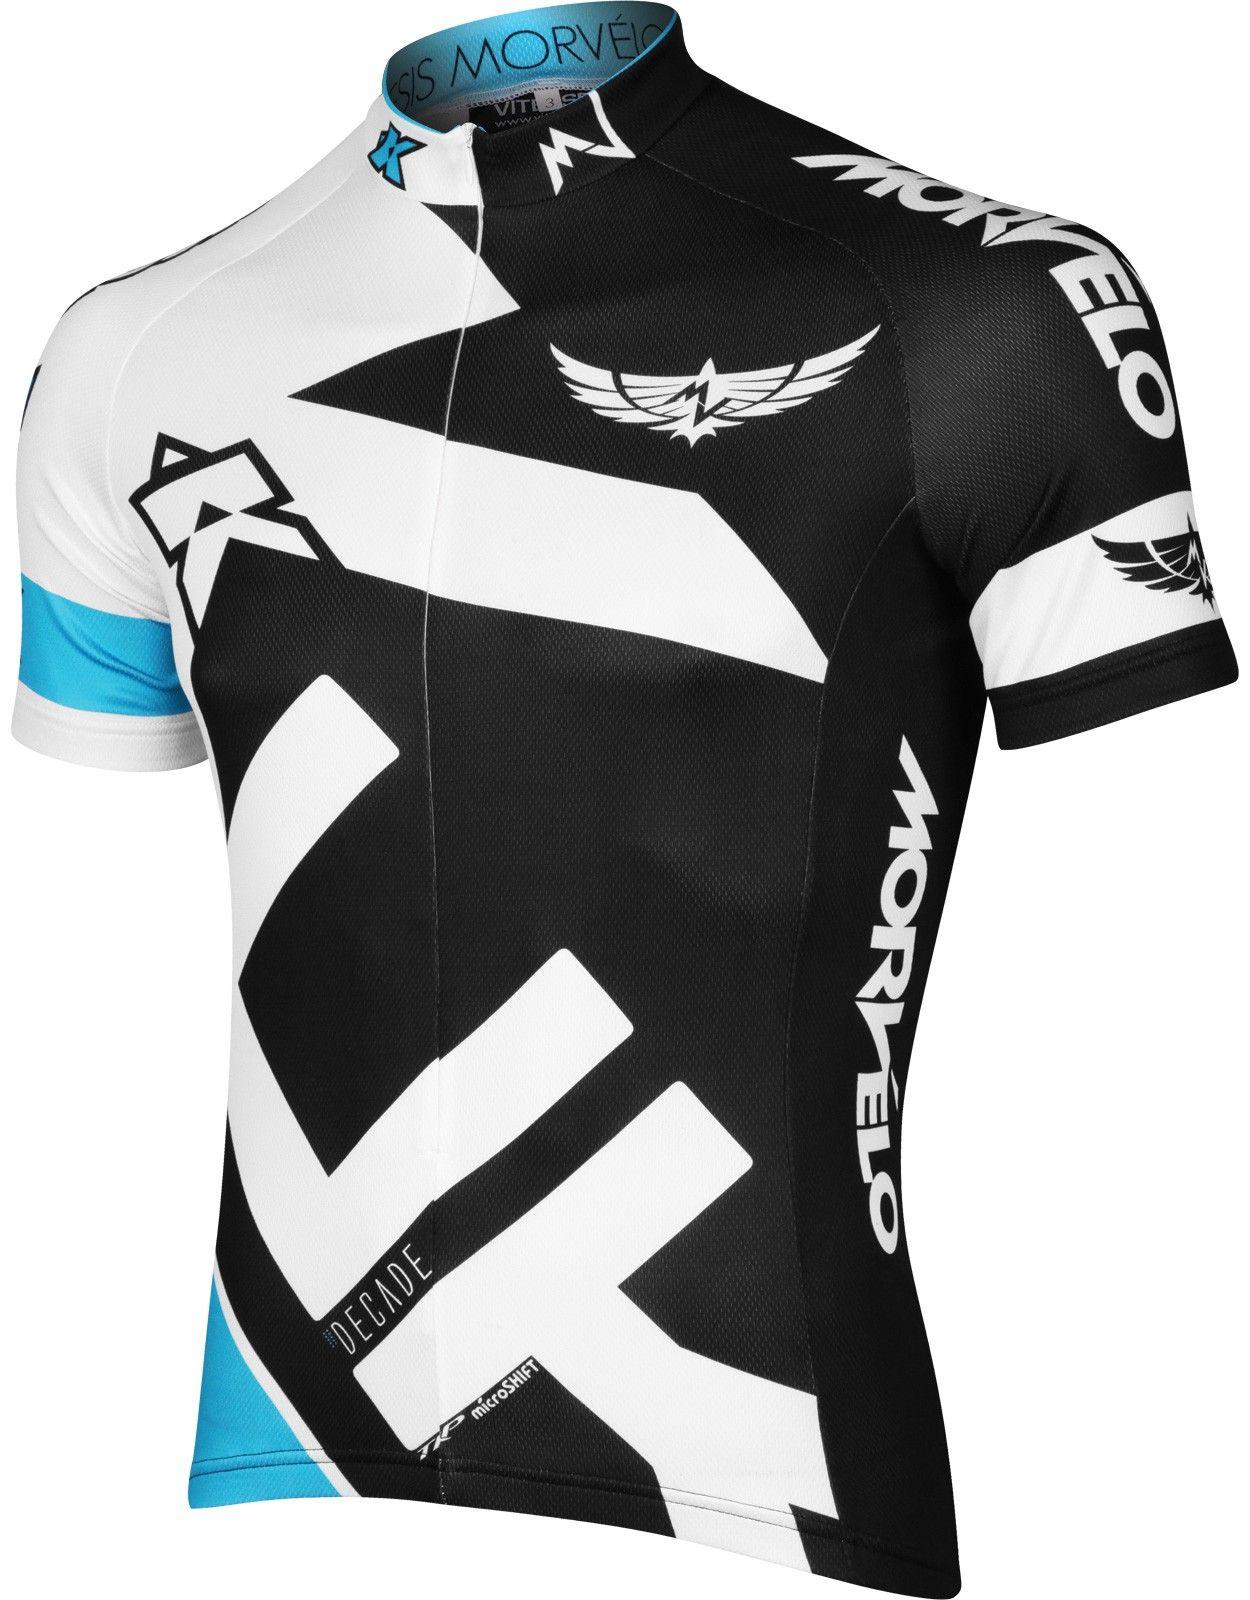 Bike Jersey Cycling Outfit Cycling Tops Cycling Wear